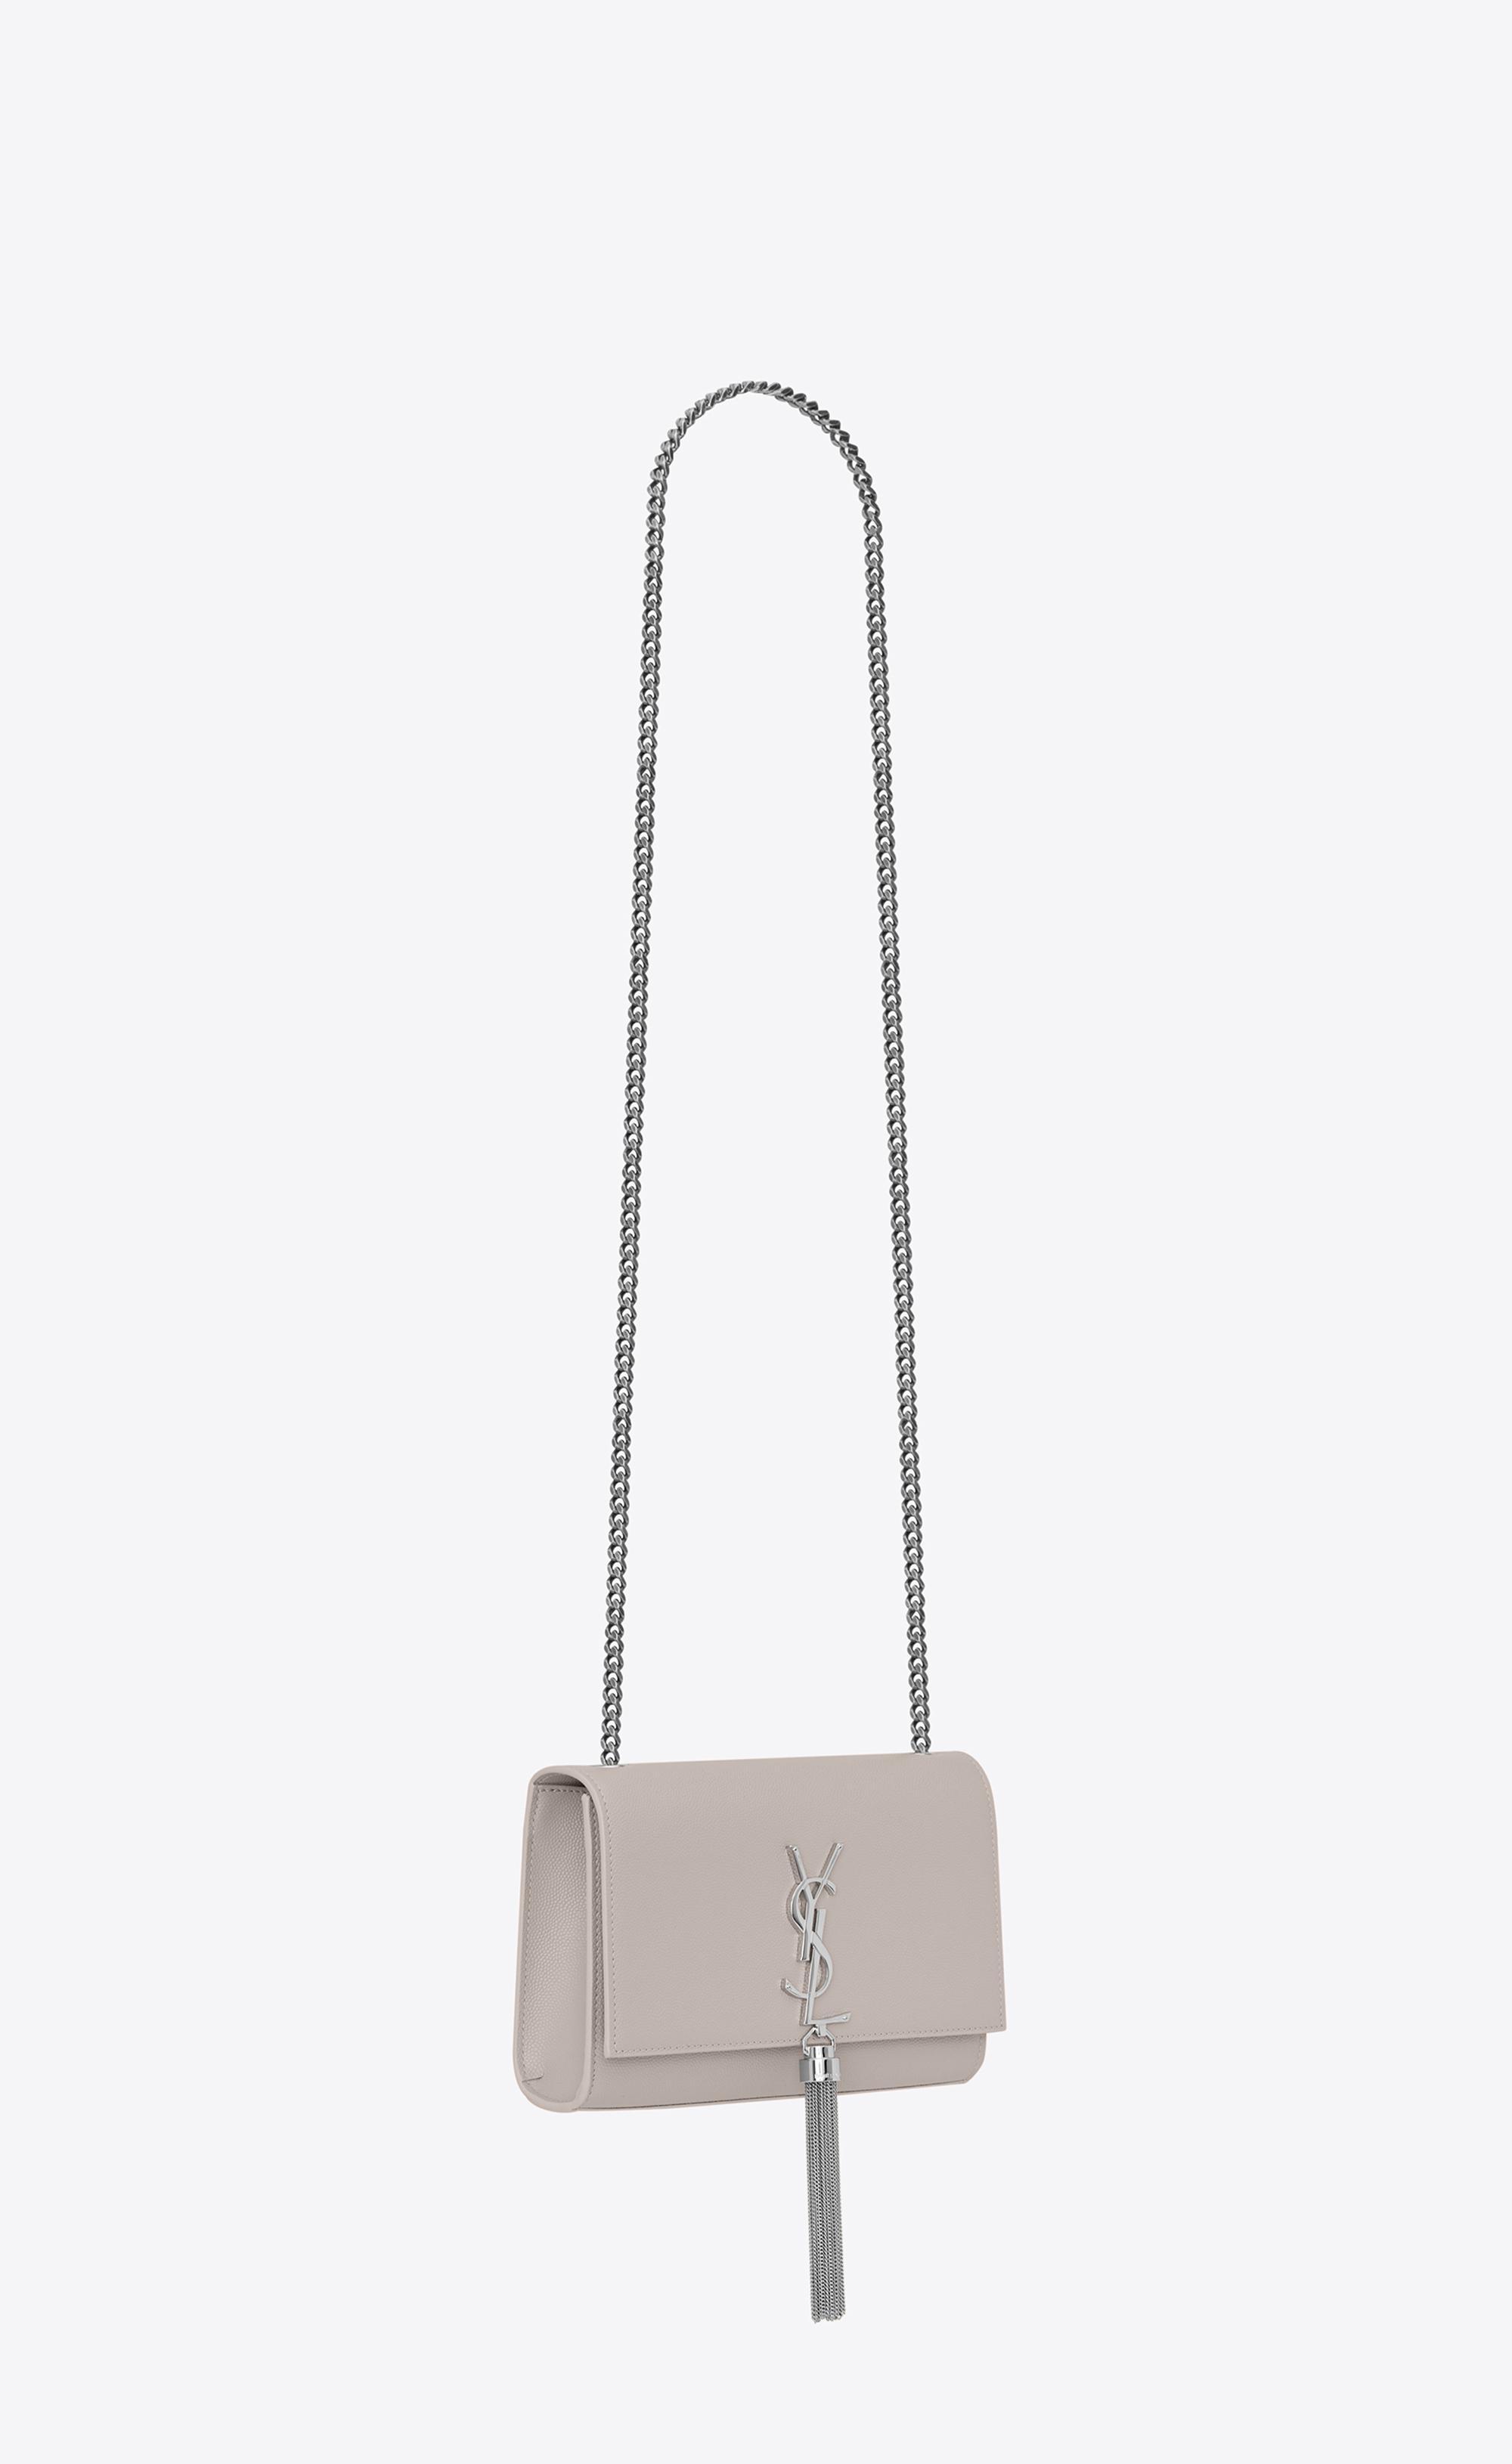 e1f4d518 Women's White Kate Small With Tassel In Grain De Poudre Embossed Leather